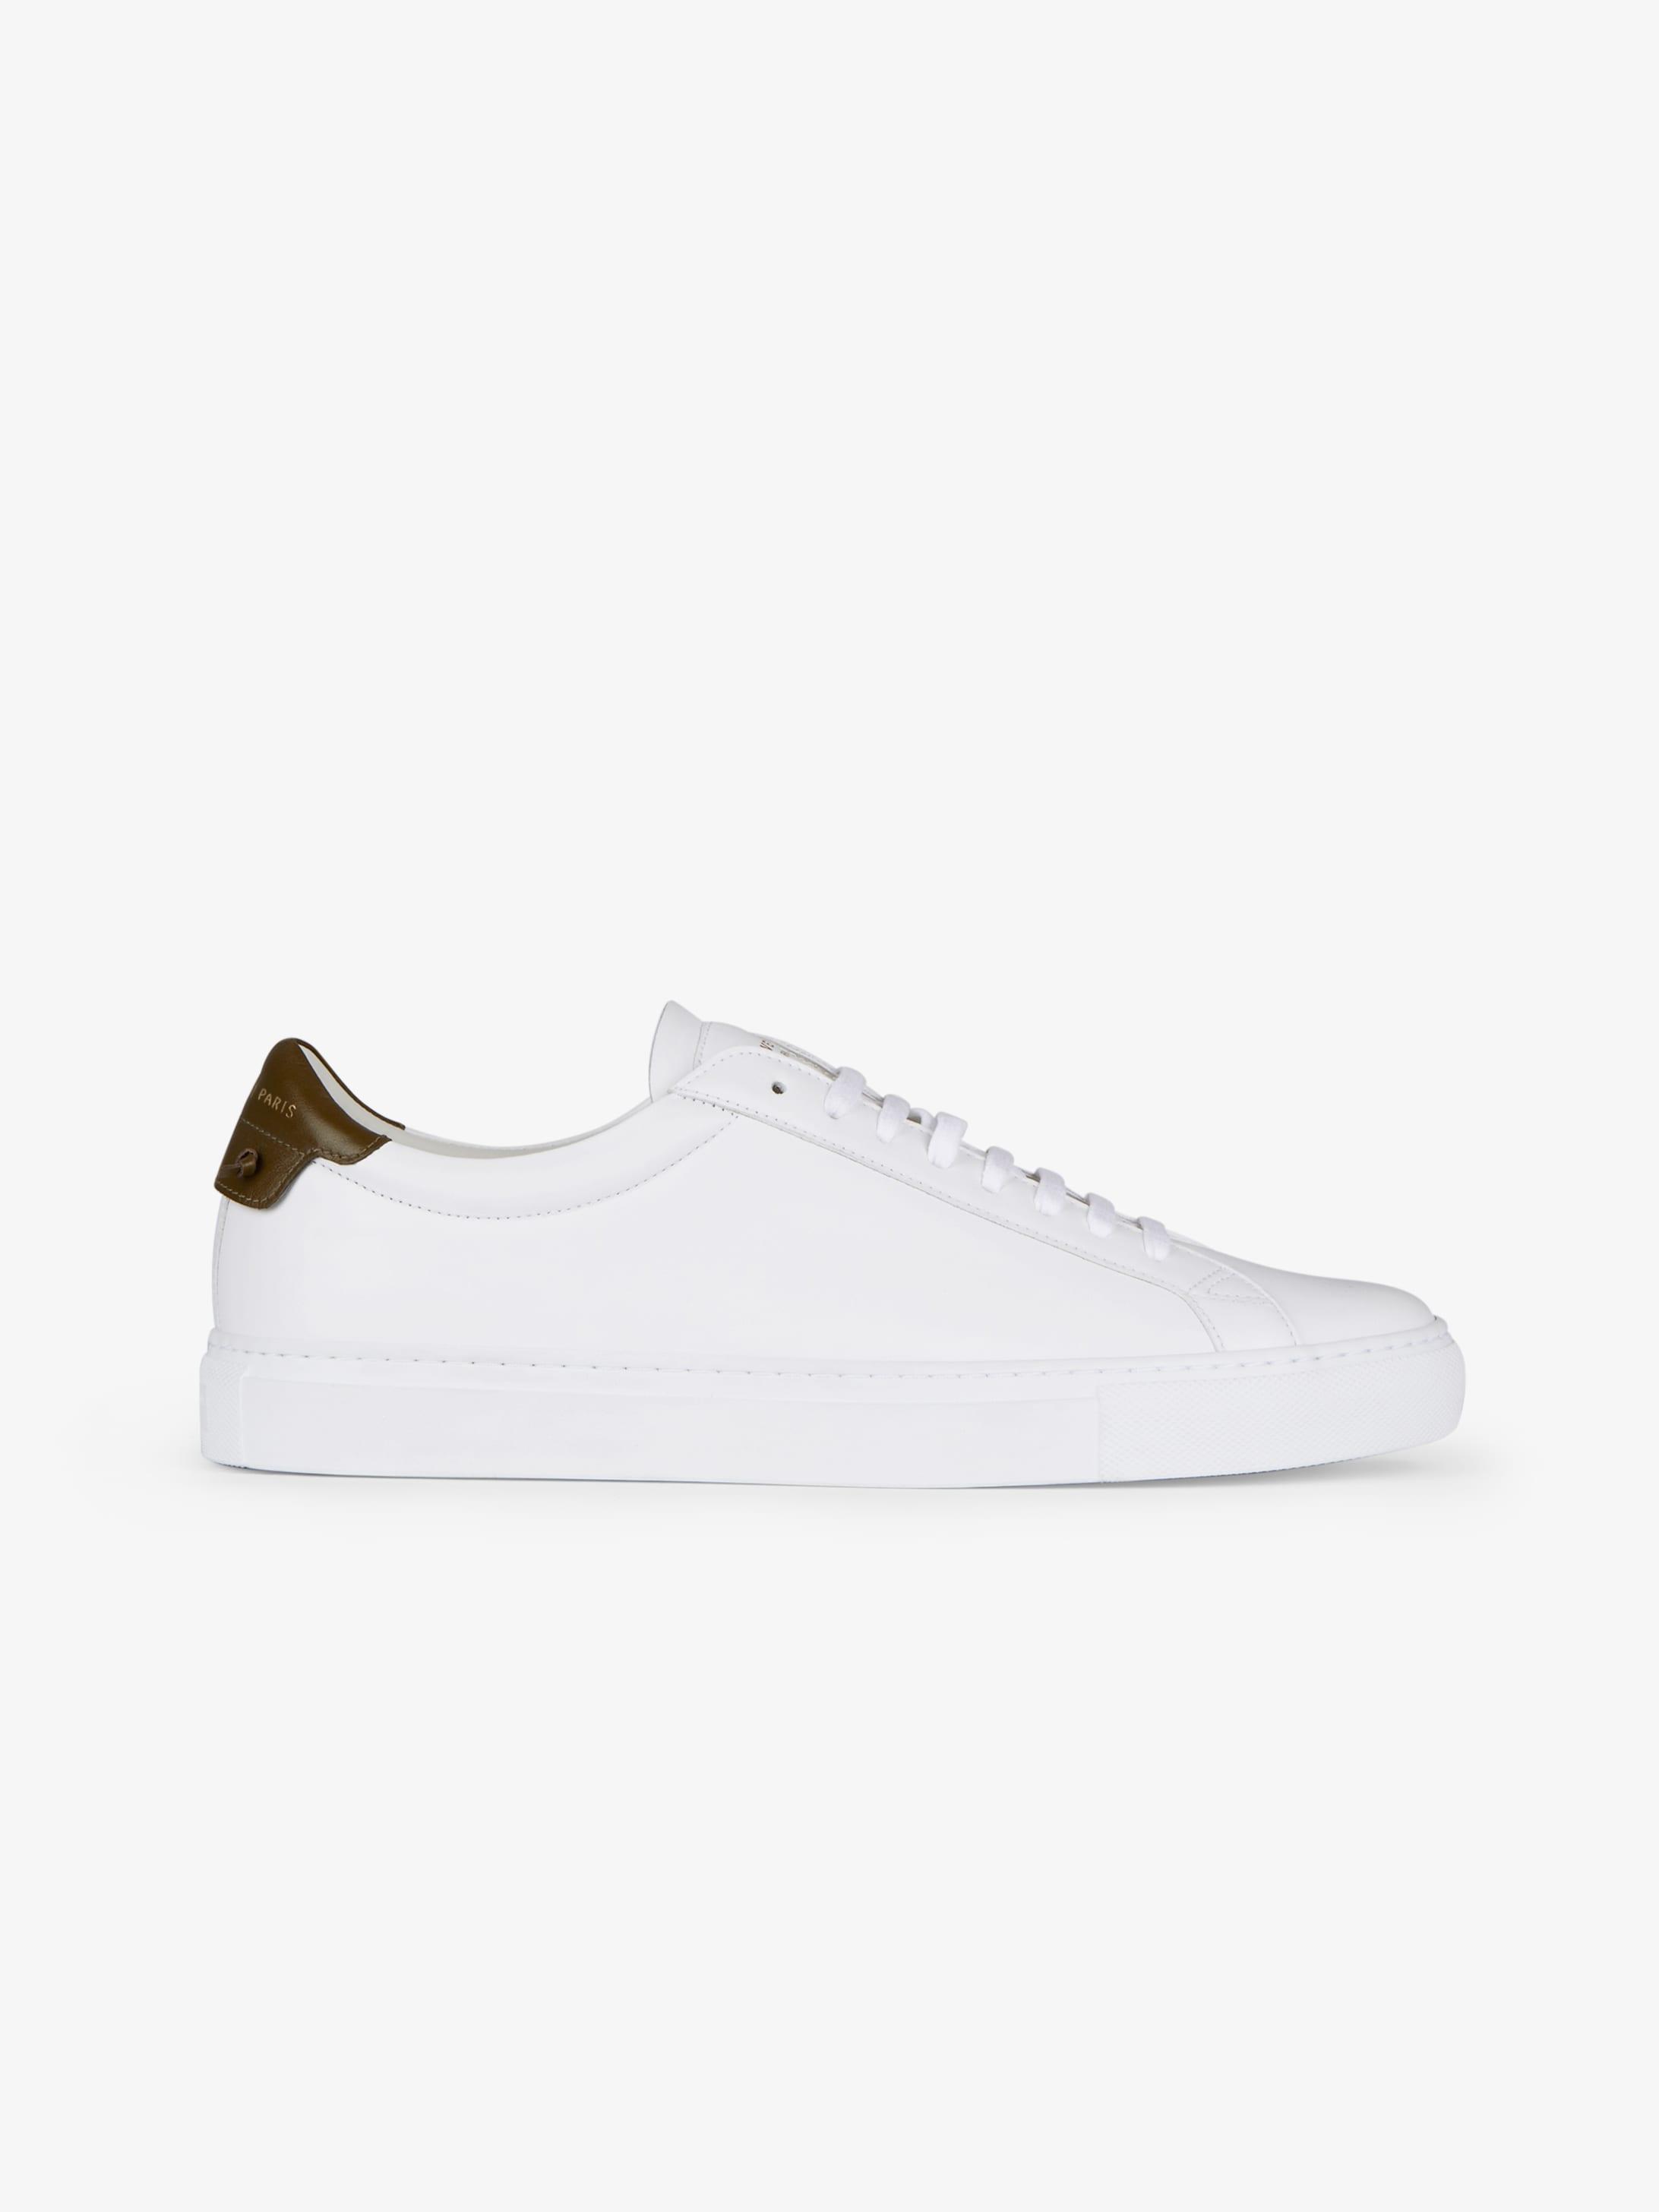 Sneakers en cuir mat bicolore